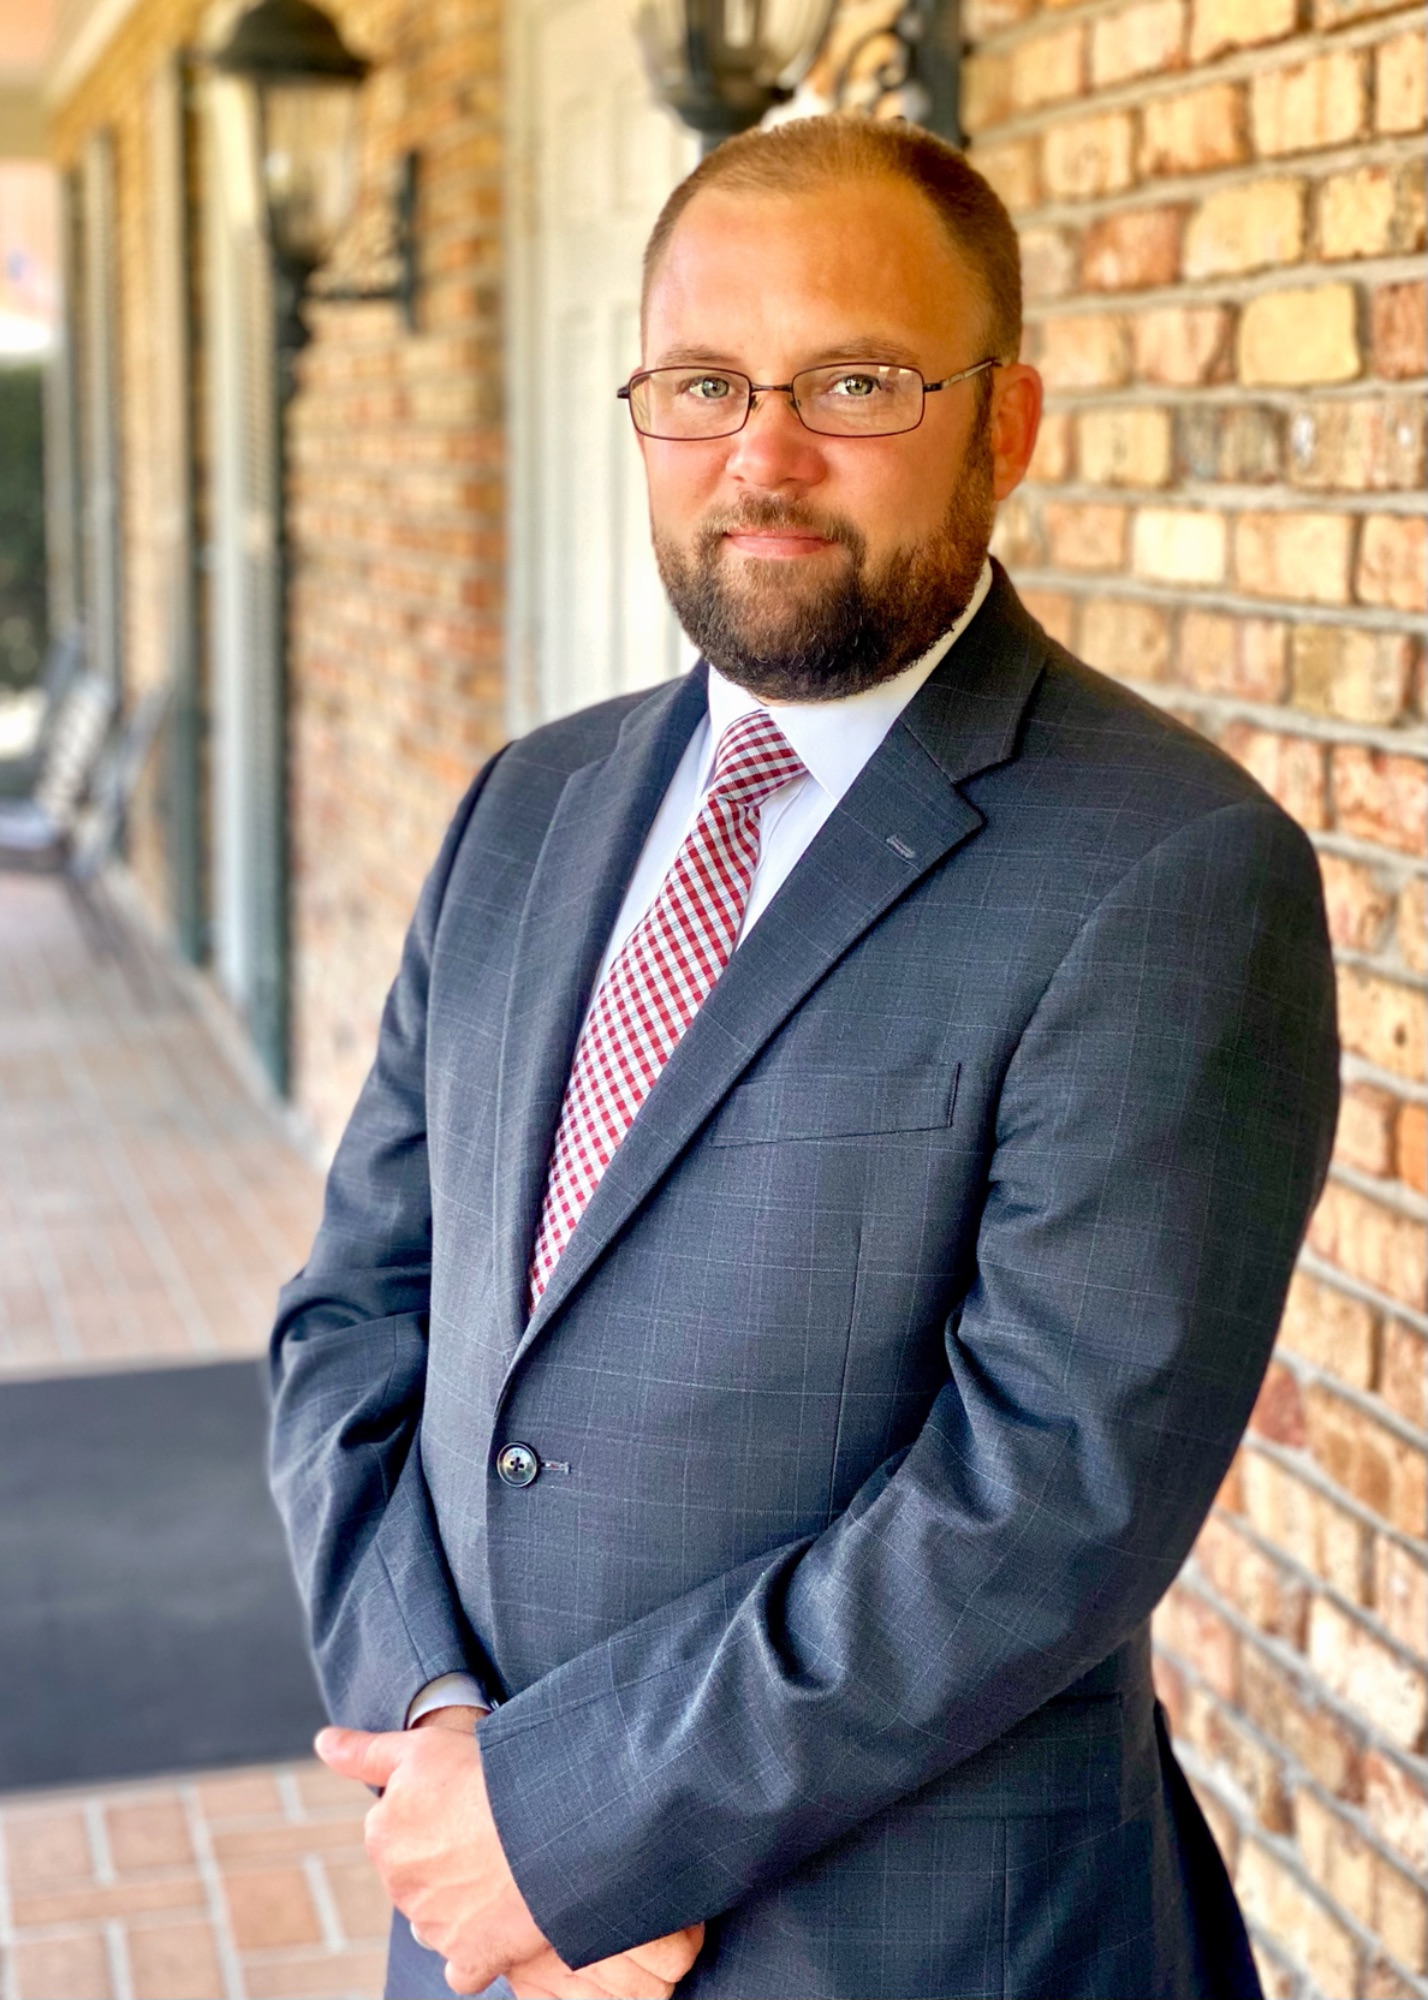 Photo of David R. Credeur - Funeral Director